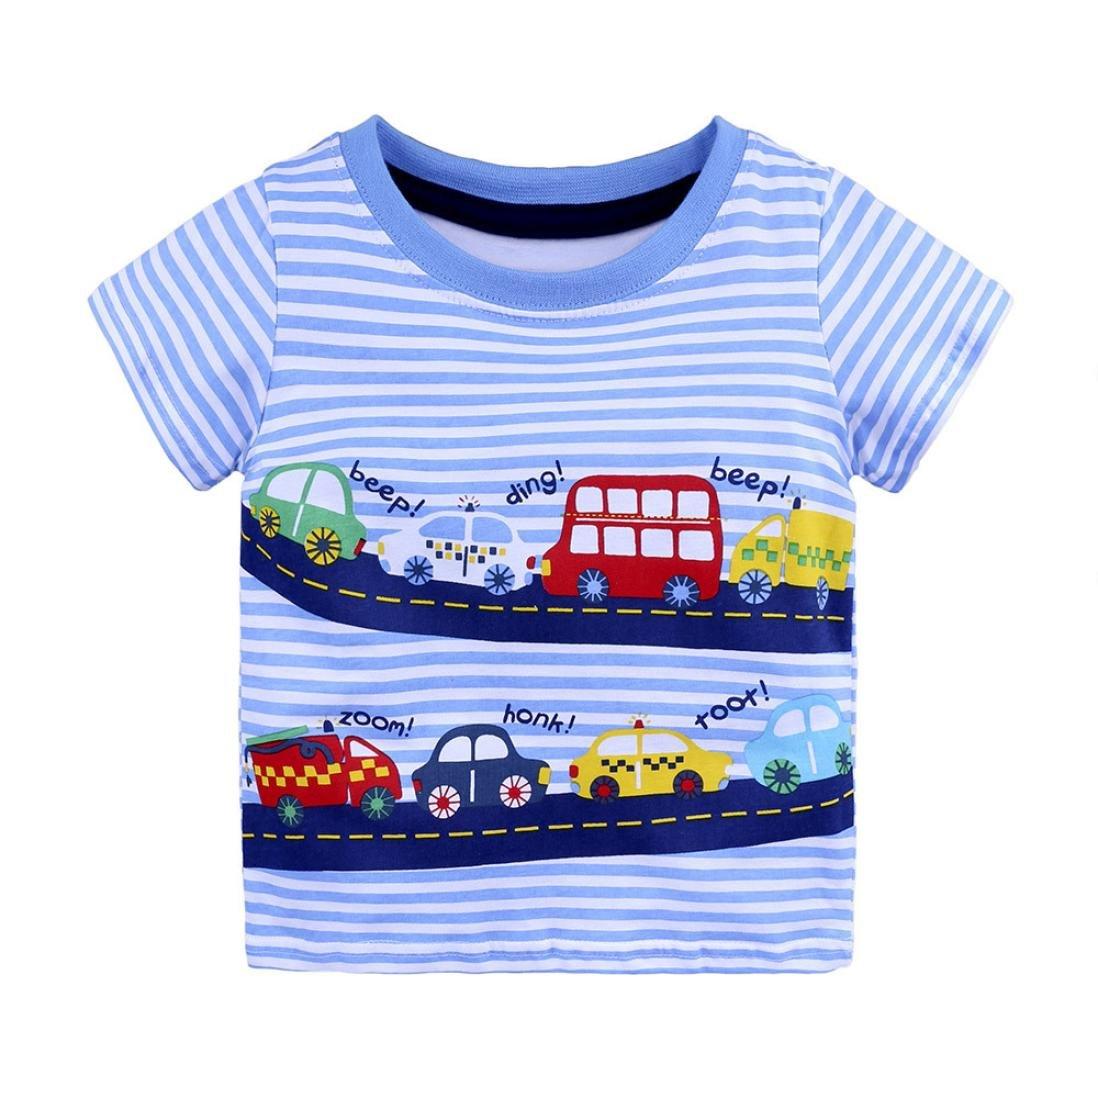 Webla Baby Boys Girls Kids Cartoon Print Summer Tops T Shirts for 1-6 Years Old 3-4T, Orange